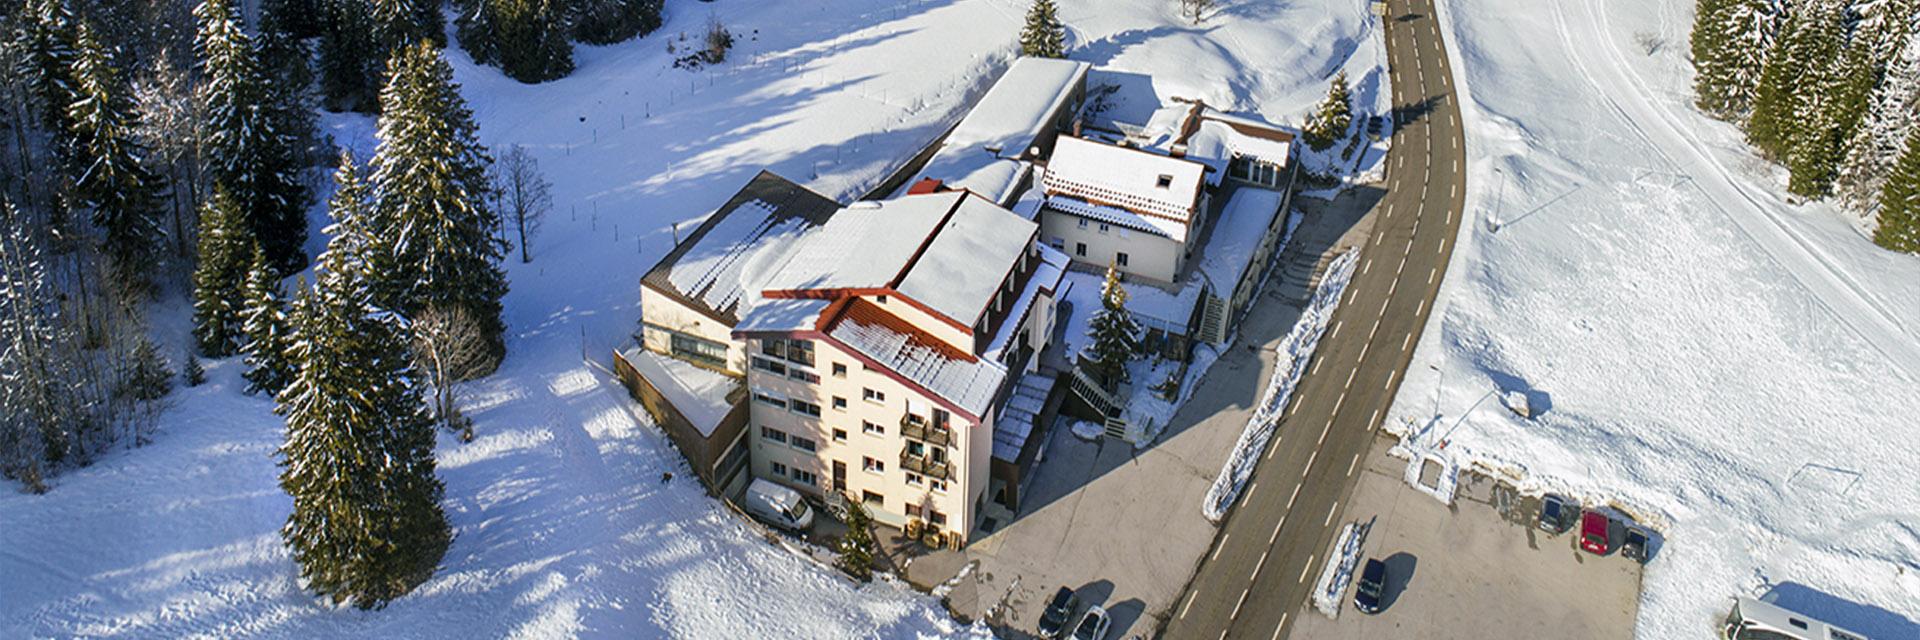 Village_club_vacances_jure-neige-et-plein-air-vue-village-hiver